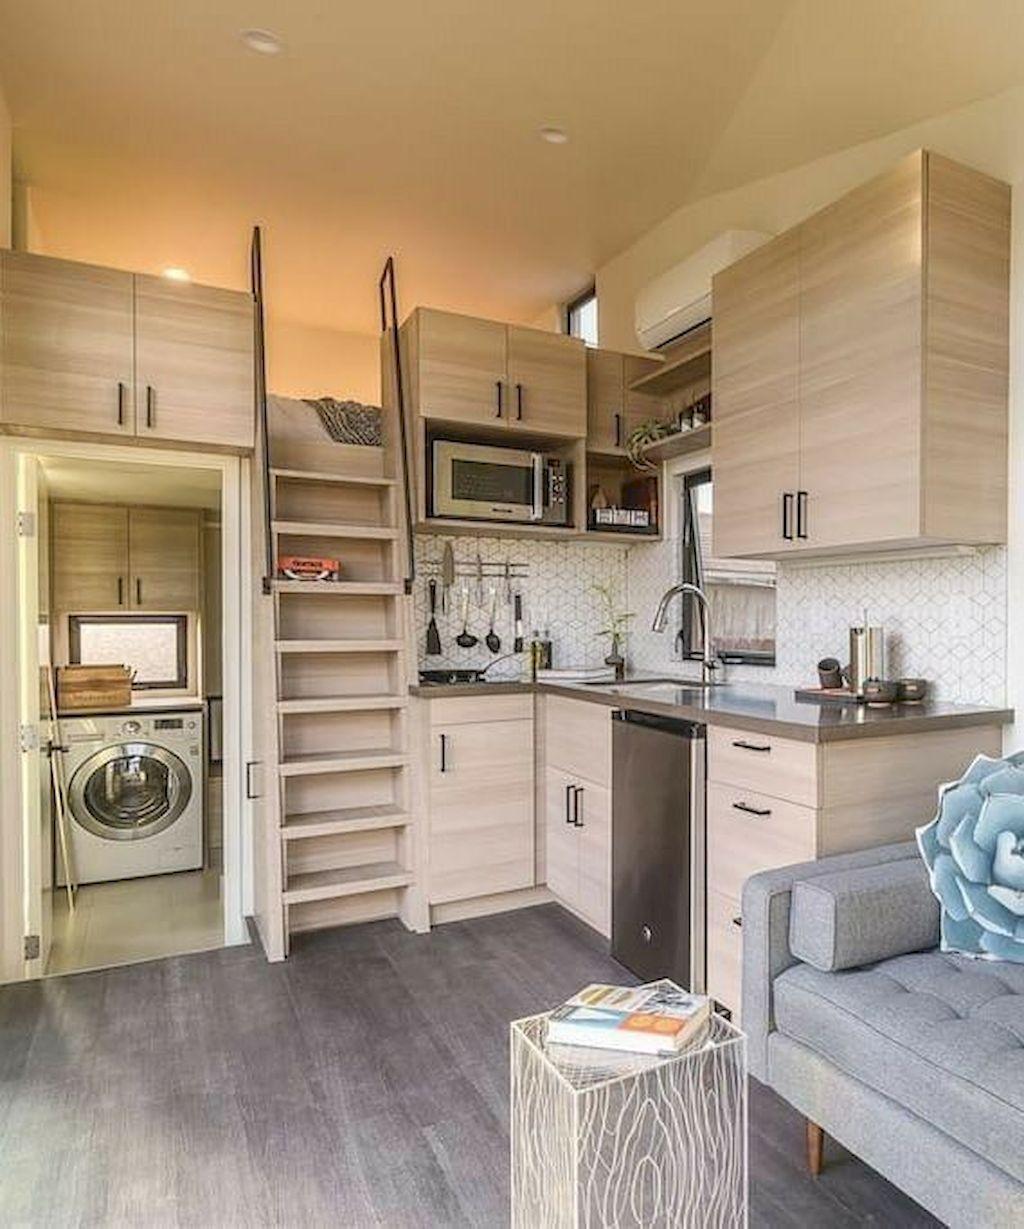 60 tiny house kitchen storage organization and tips ideas